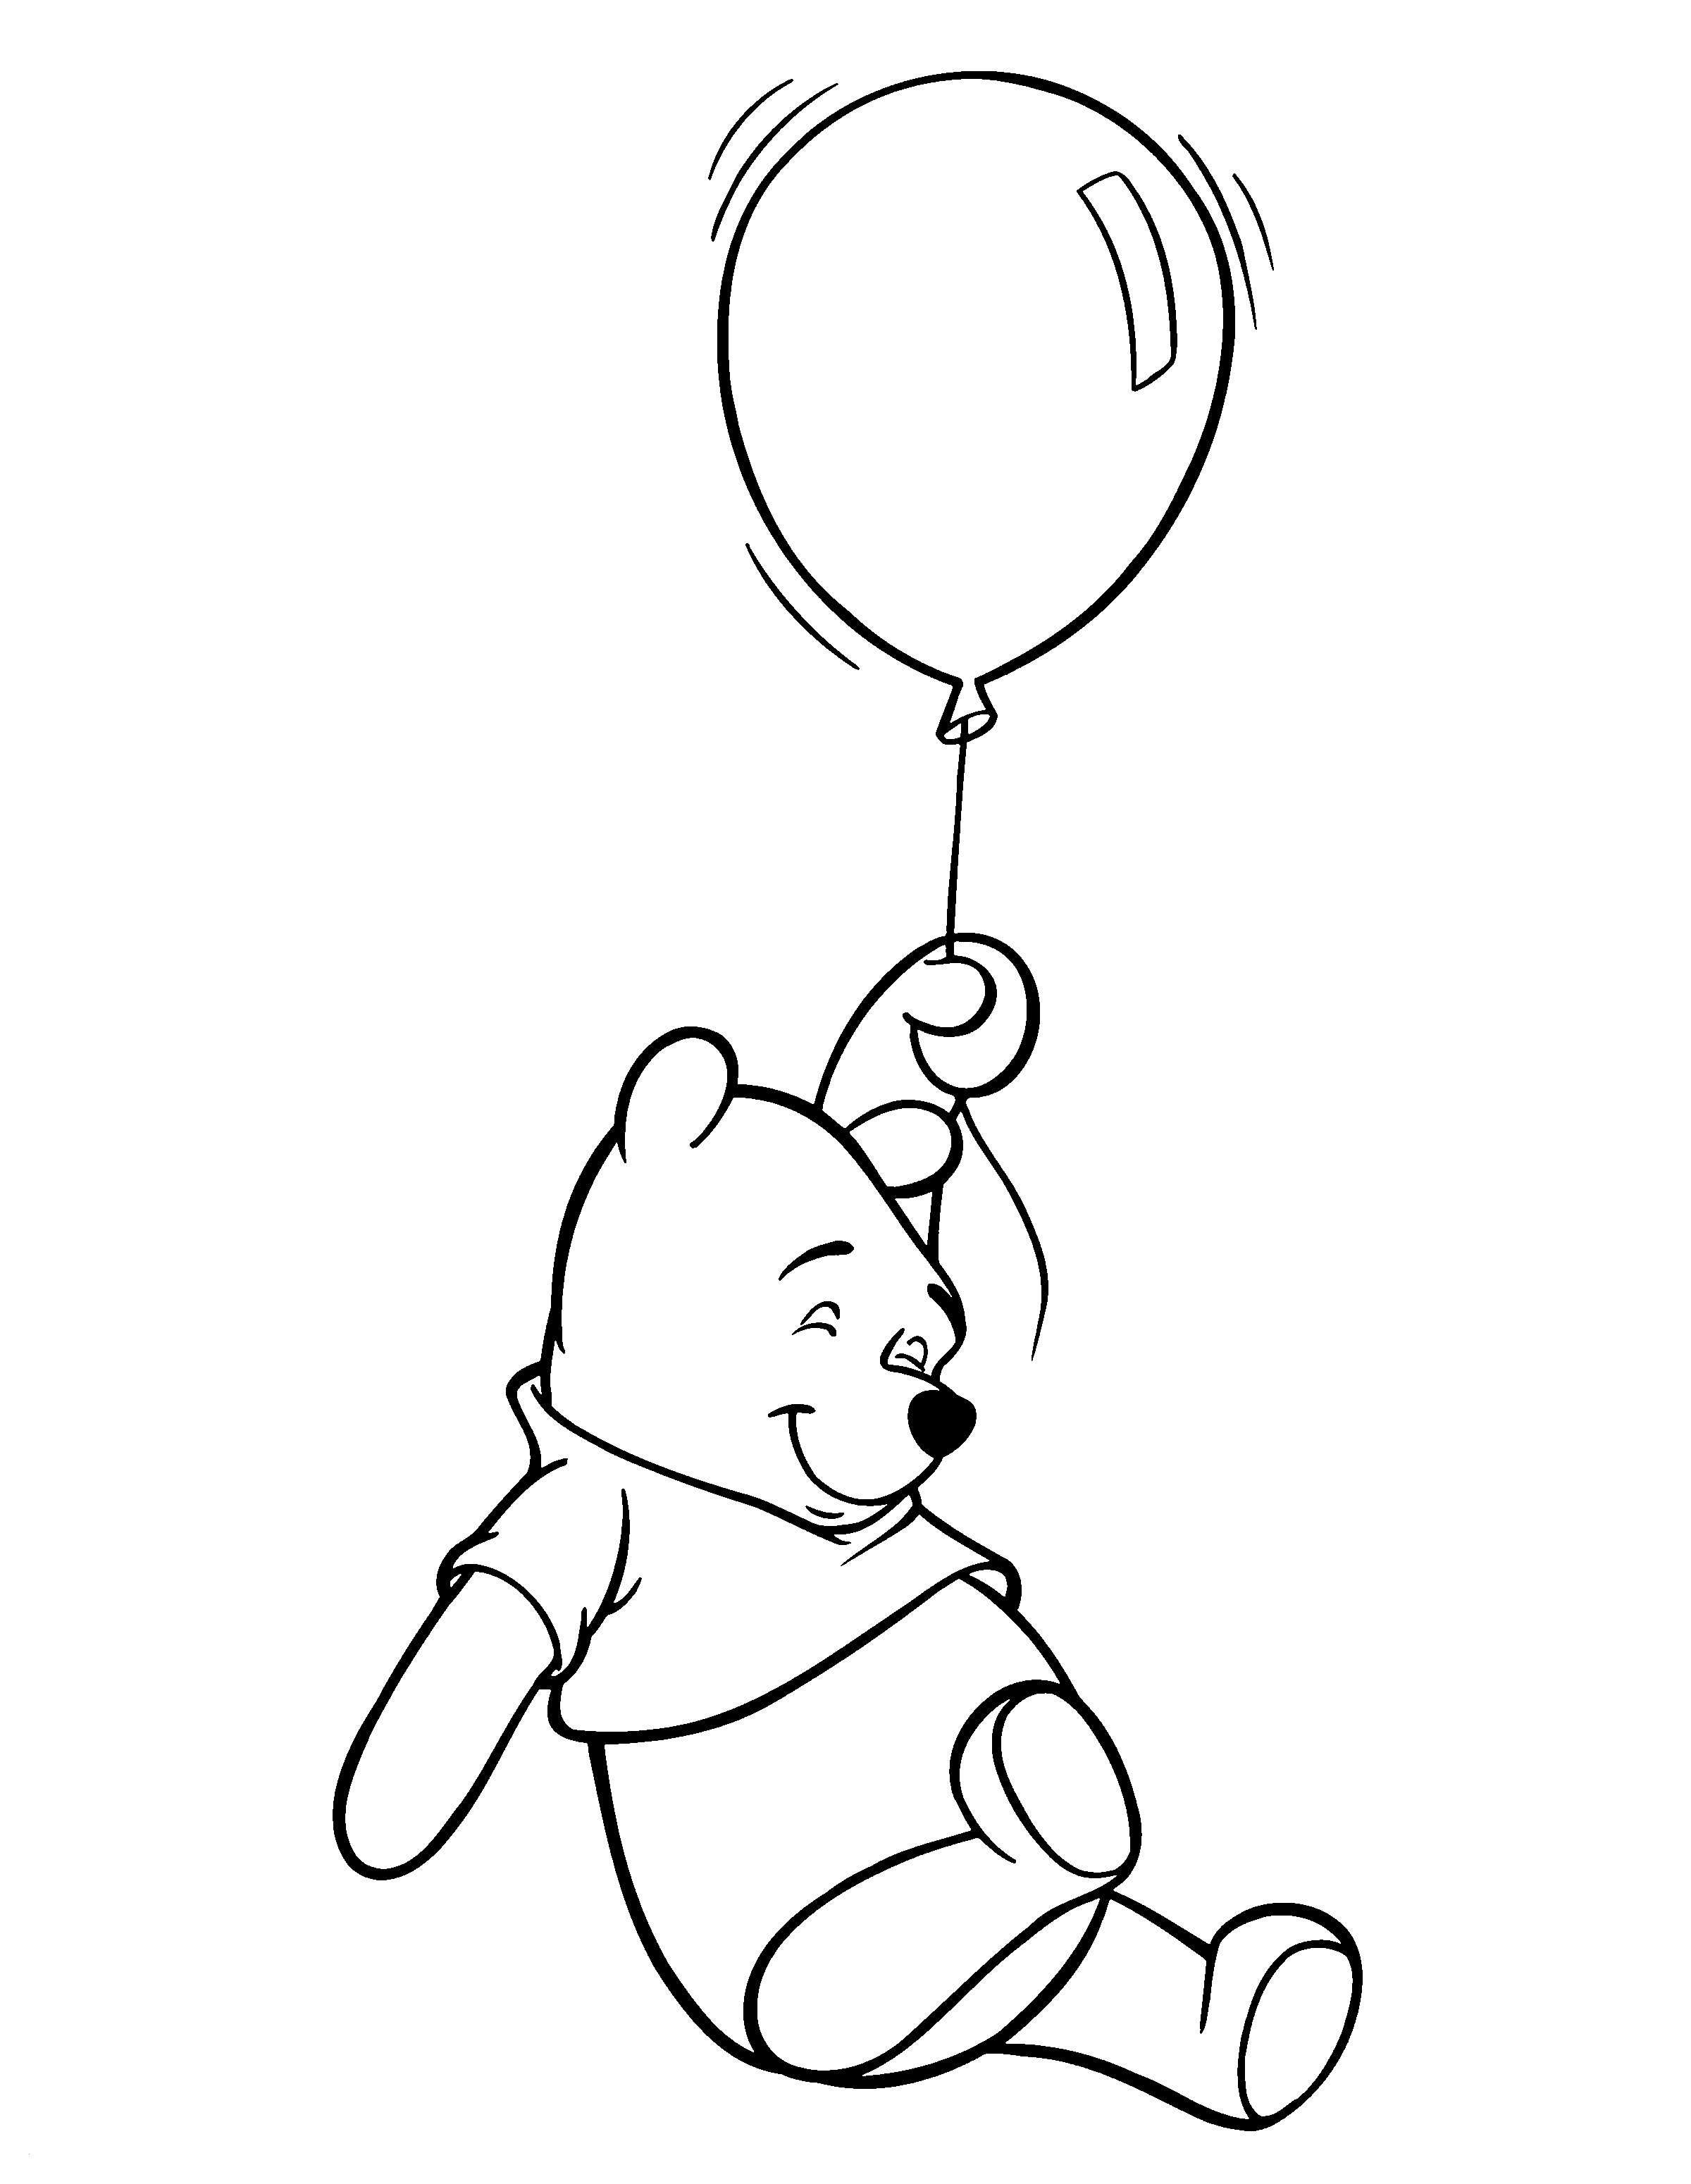 Ausmalbild Winnie Pooh Neu Tigger From Winnie the Pooh Coloring Pages Inspirational 37 Bild